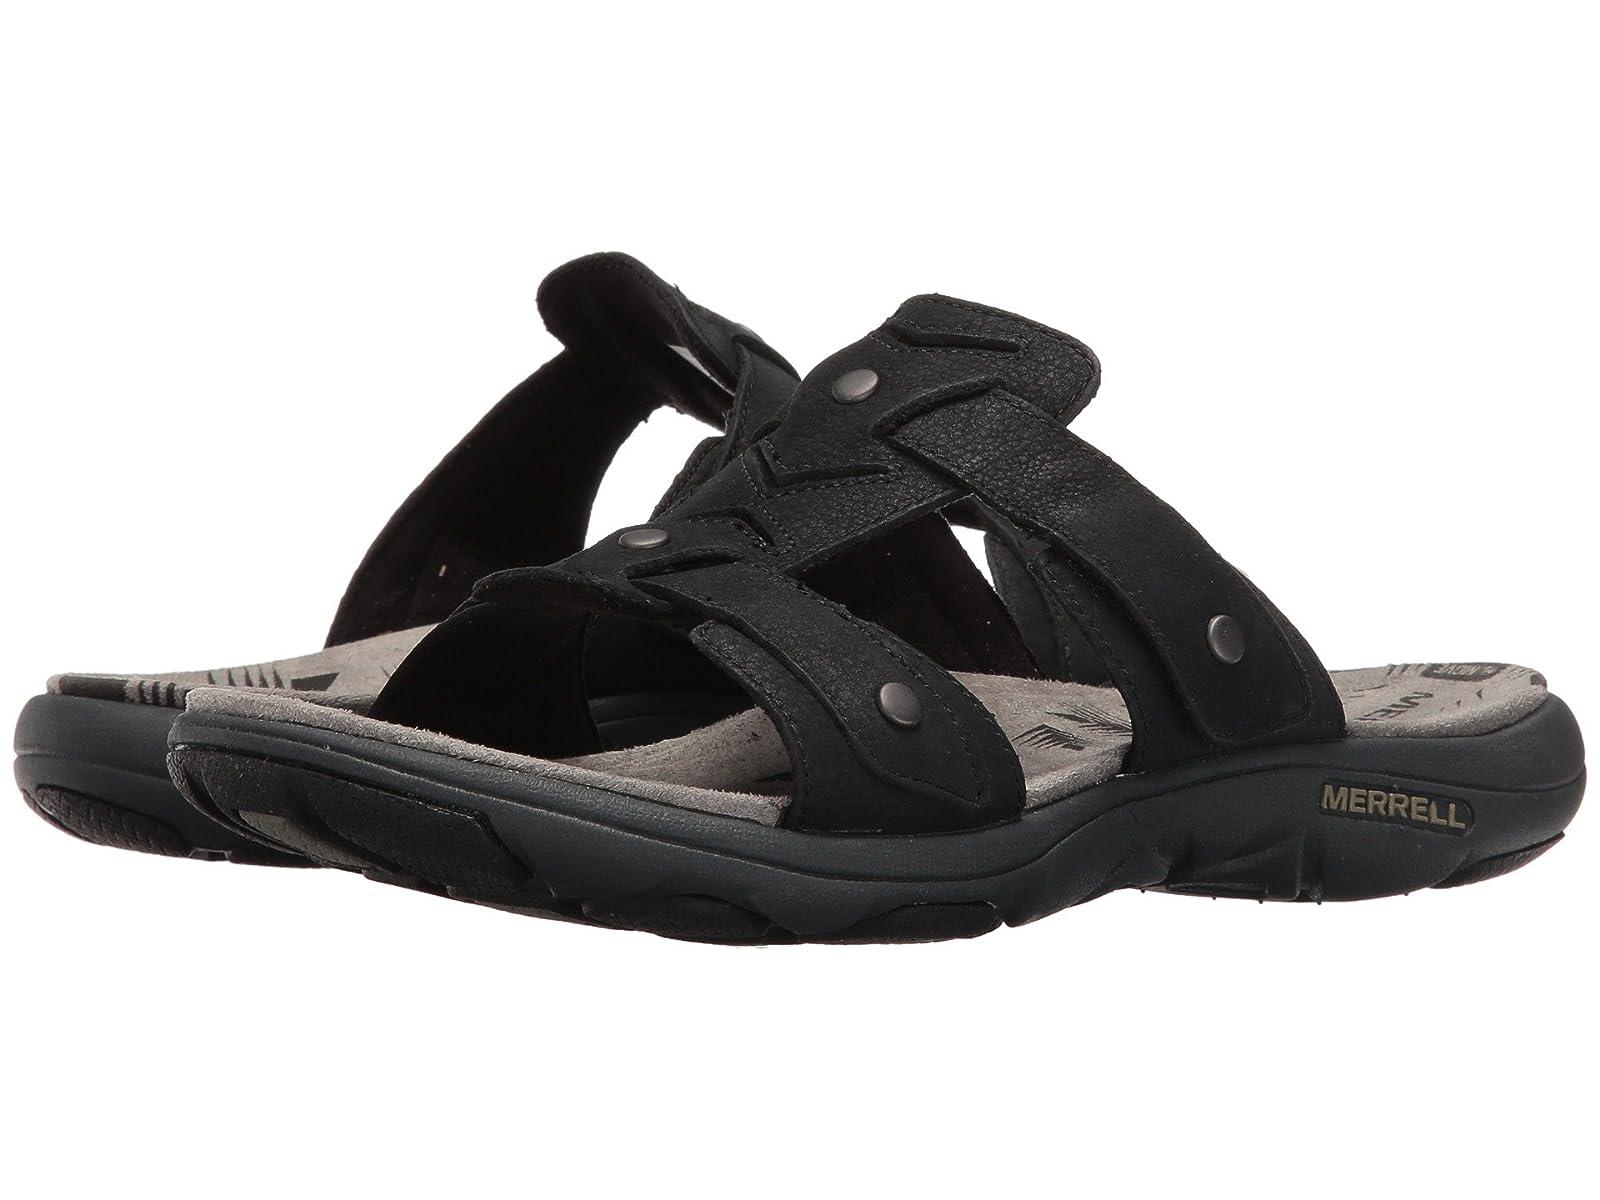 Merrell Adhera Slide IICheap and distinctive eye-catching shoes